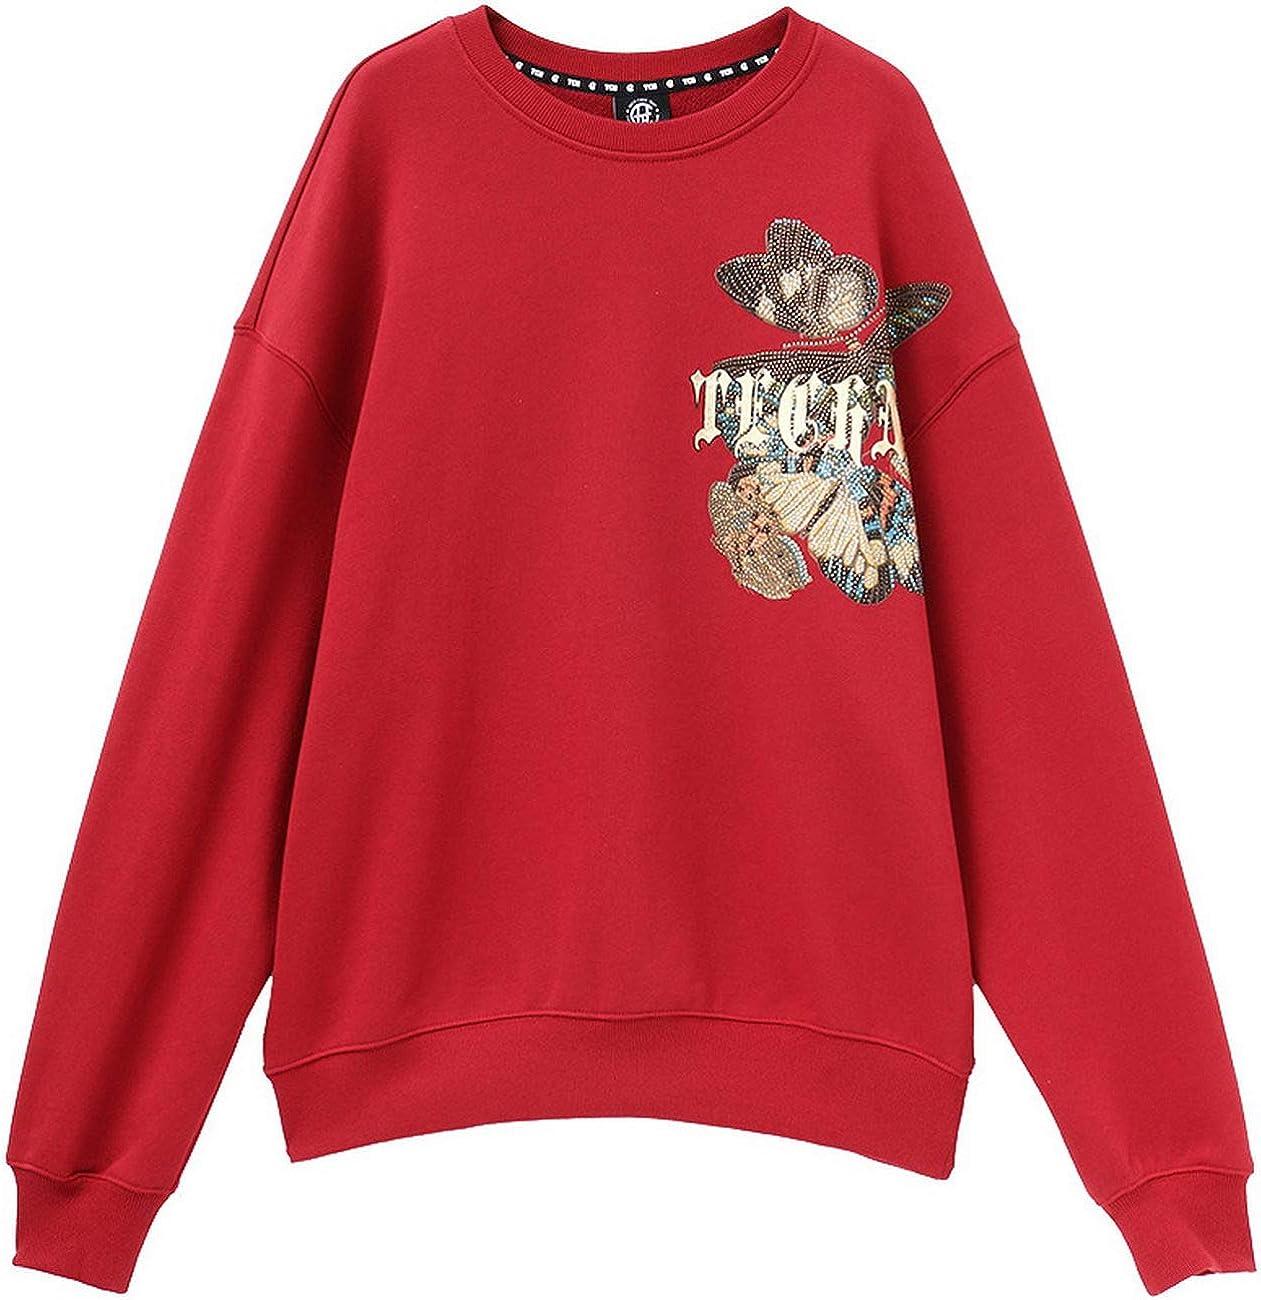 Light Luxury Tide Brand Large C hot Beads Round Neck Sweater T194116028